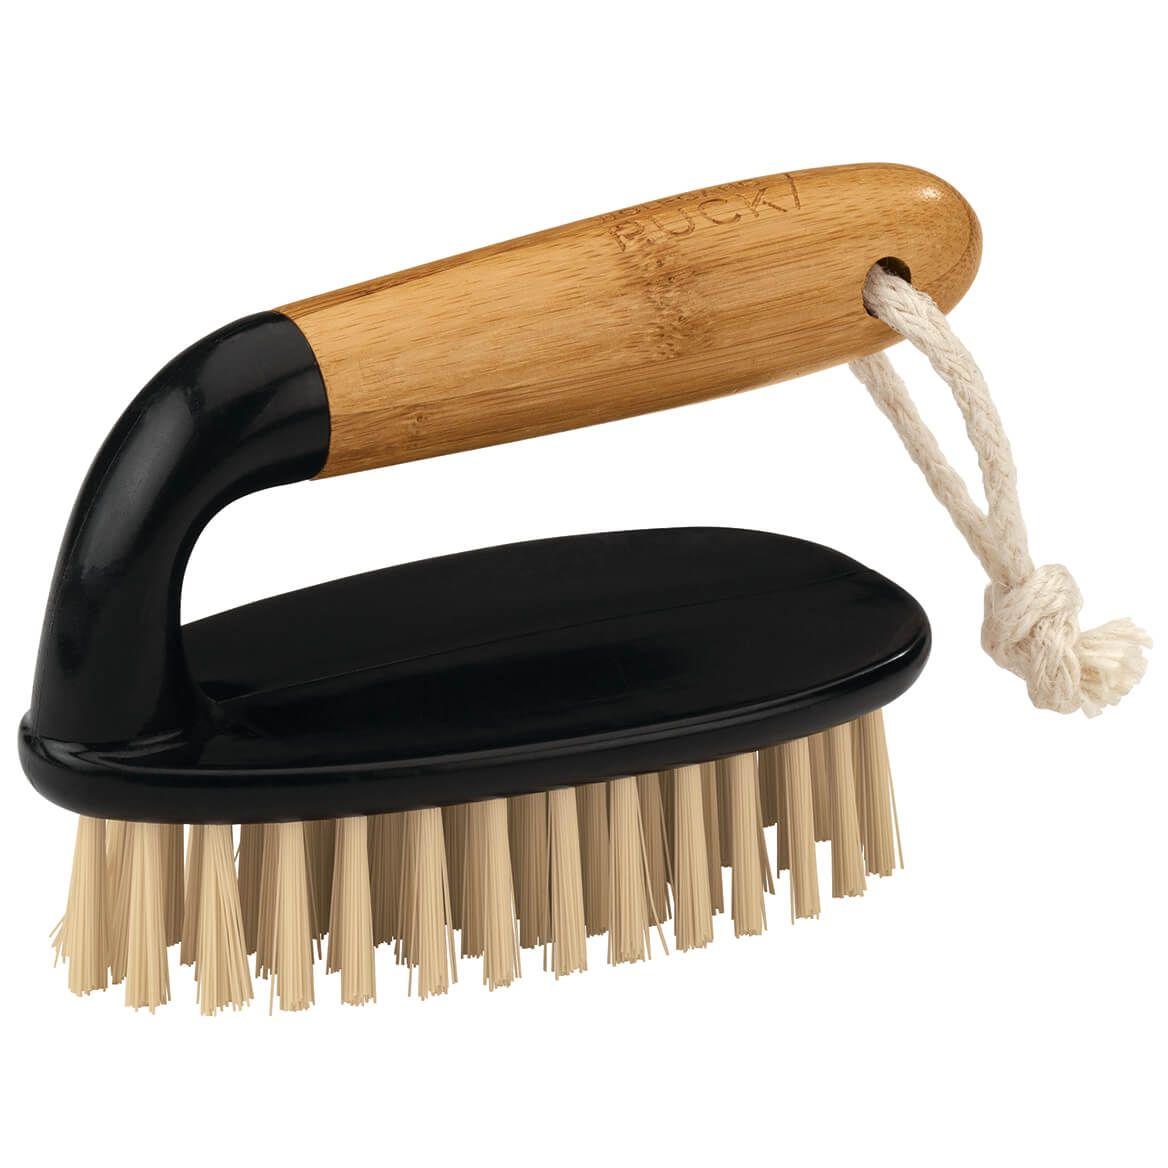 Wolfgang Puck Bamboo Scrubber Brush-371101